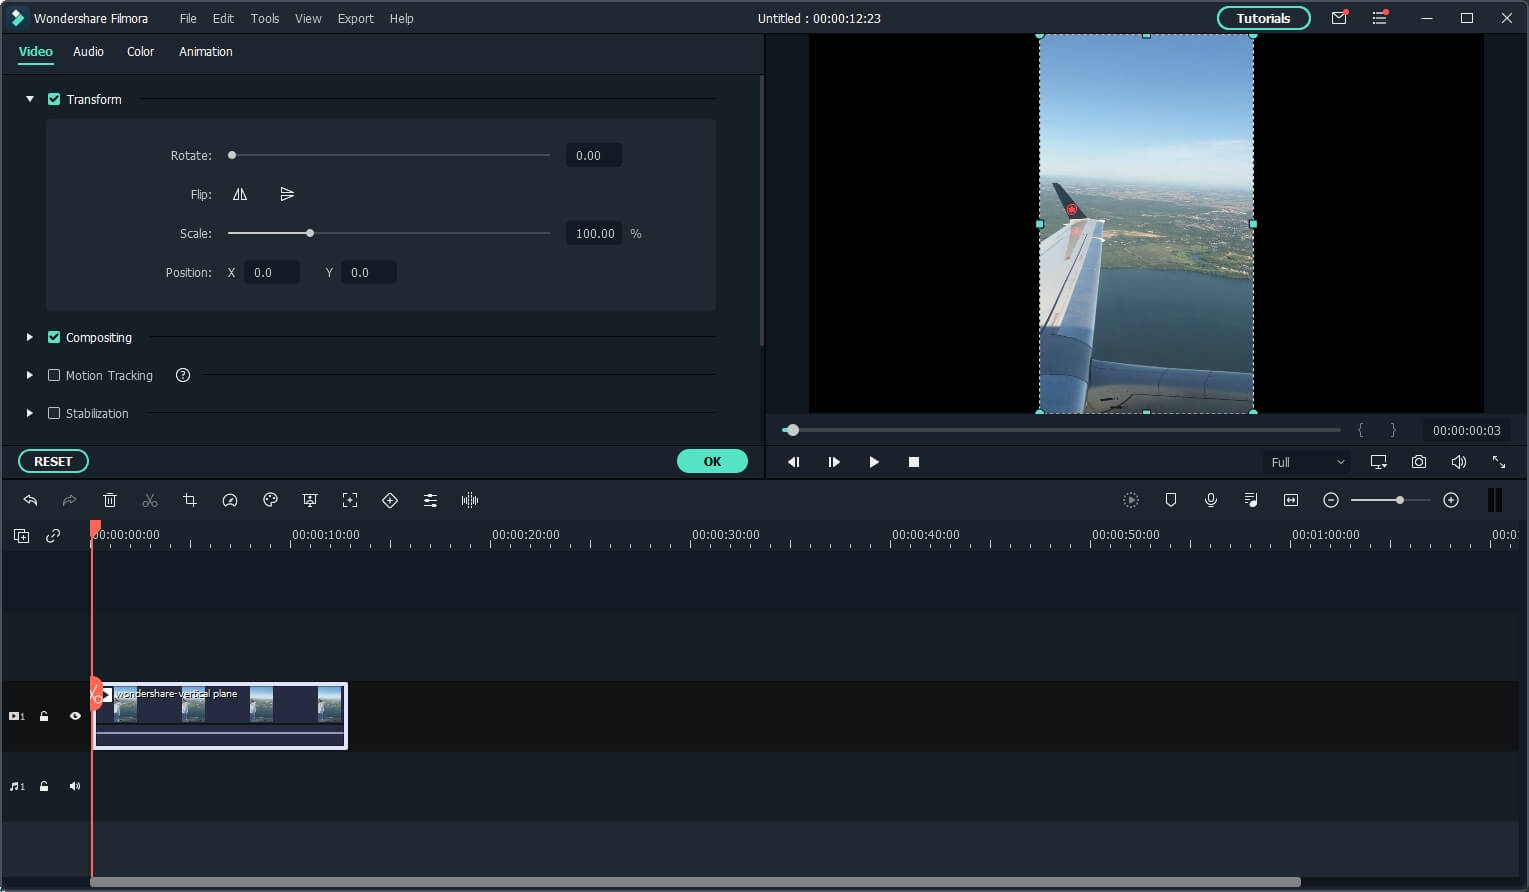 Filmora transform options